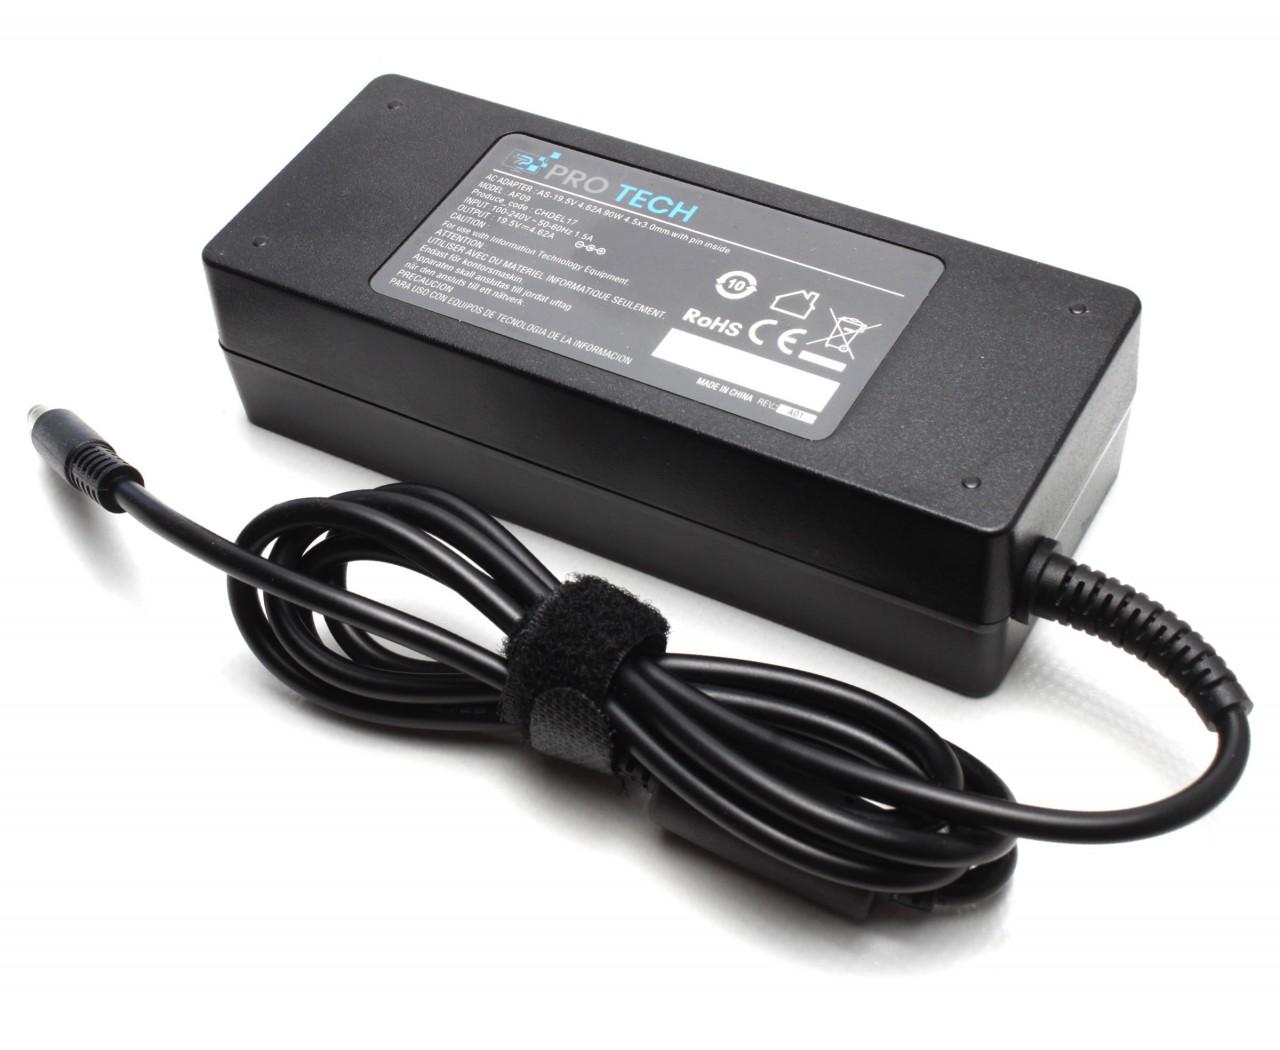 Incarcator Dell Inspiron 15 5551 90W Replacement imagine powerlaptop.ro 2021